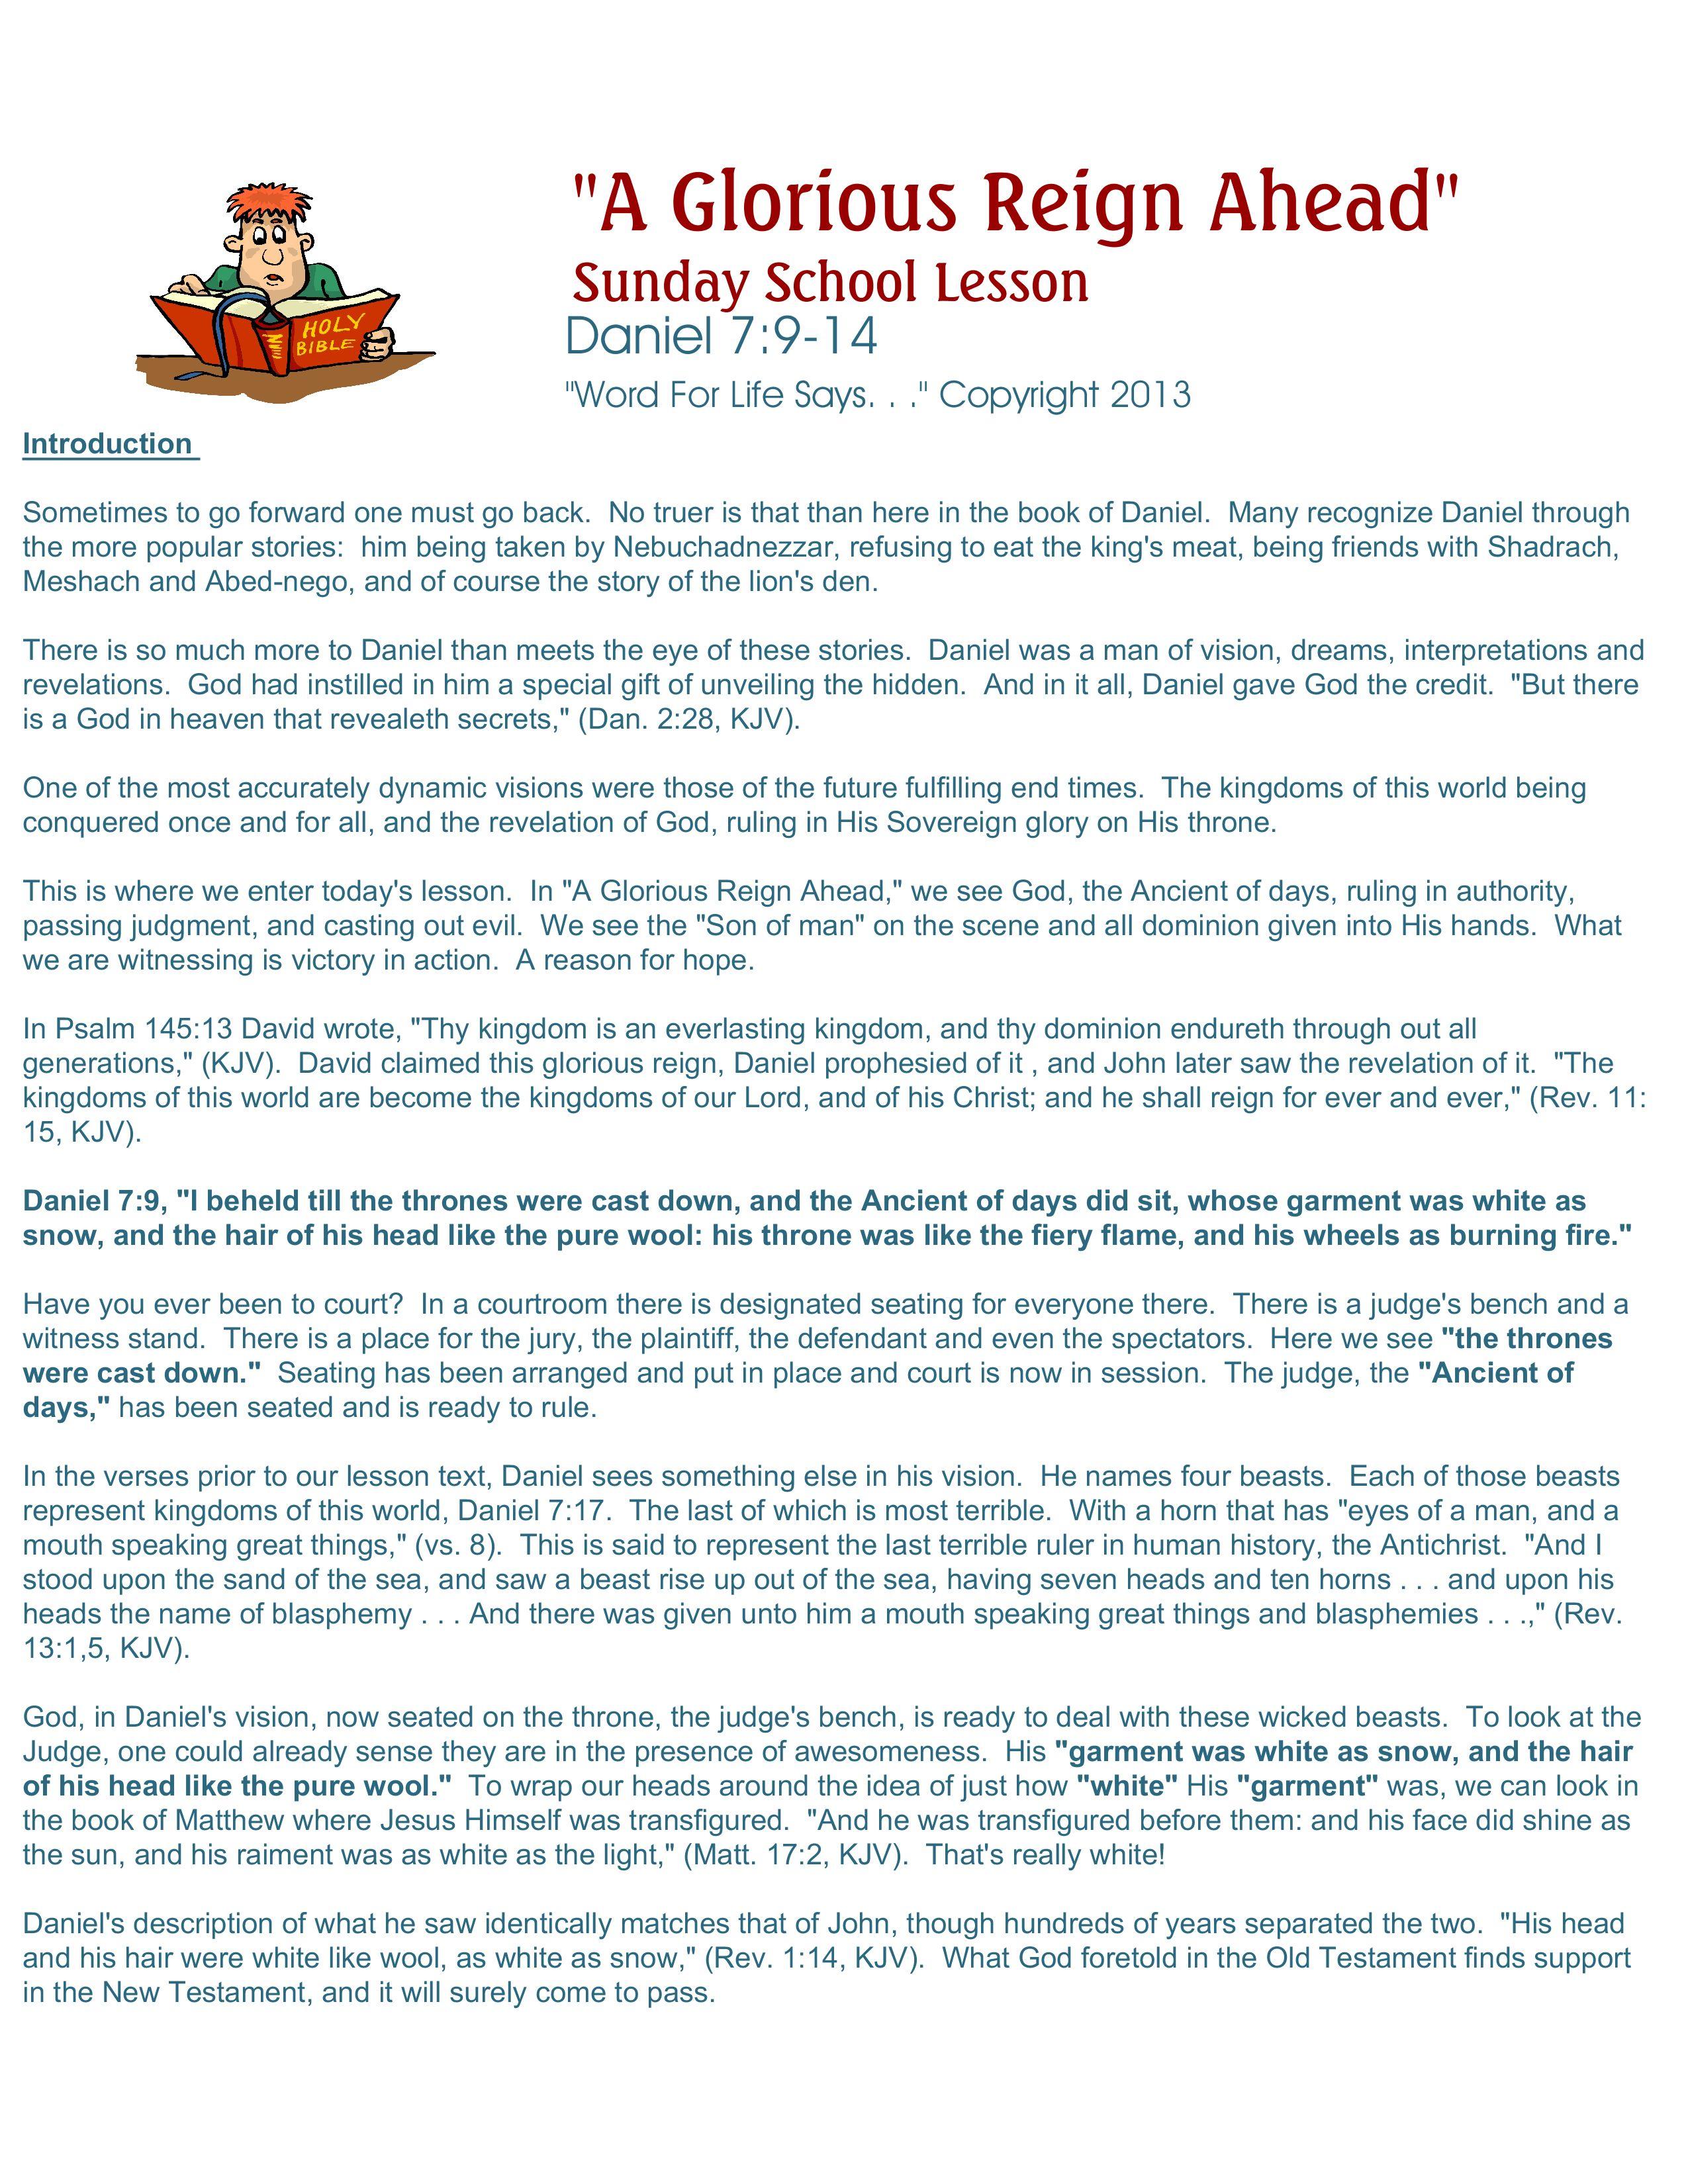 sunday lesson u201ca glorious reign ahead u201d daniel 7 9 14 word